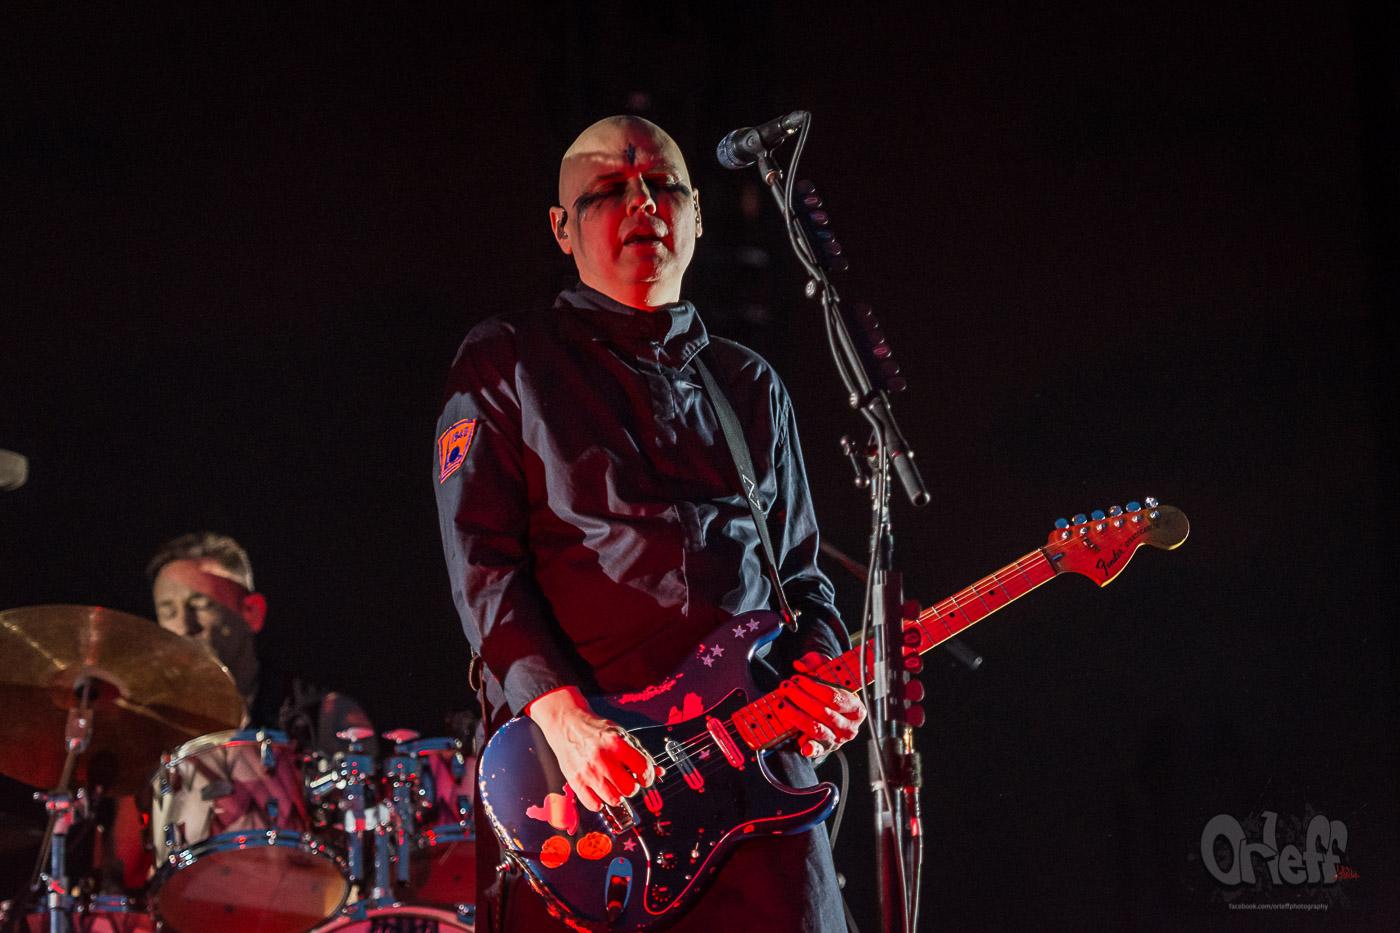 The Smashing Pumpkins @ Nova Rock 2019